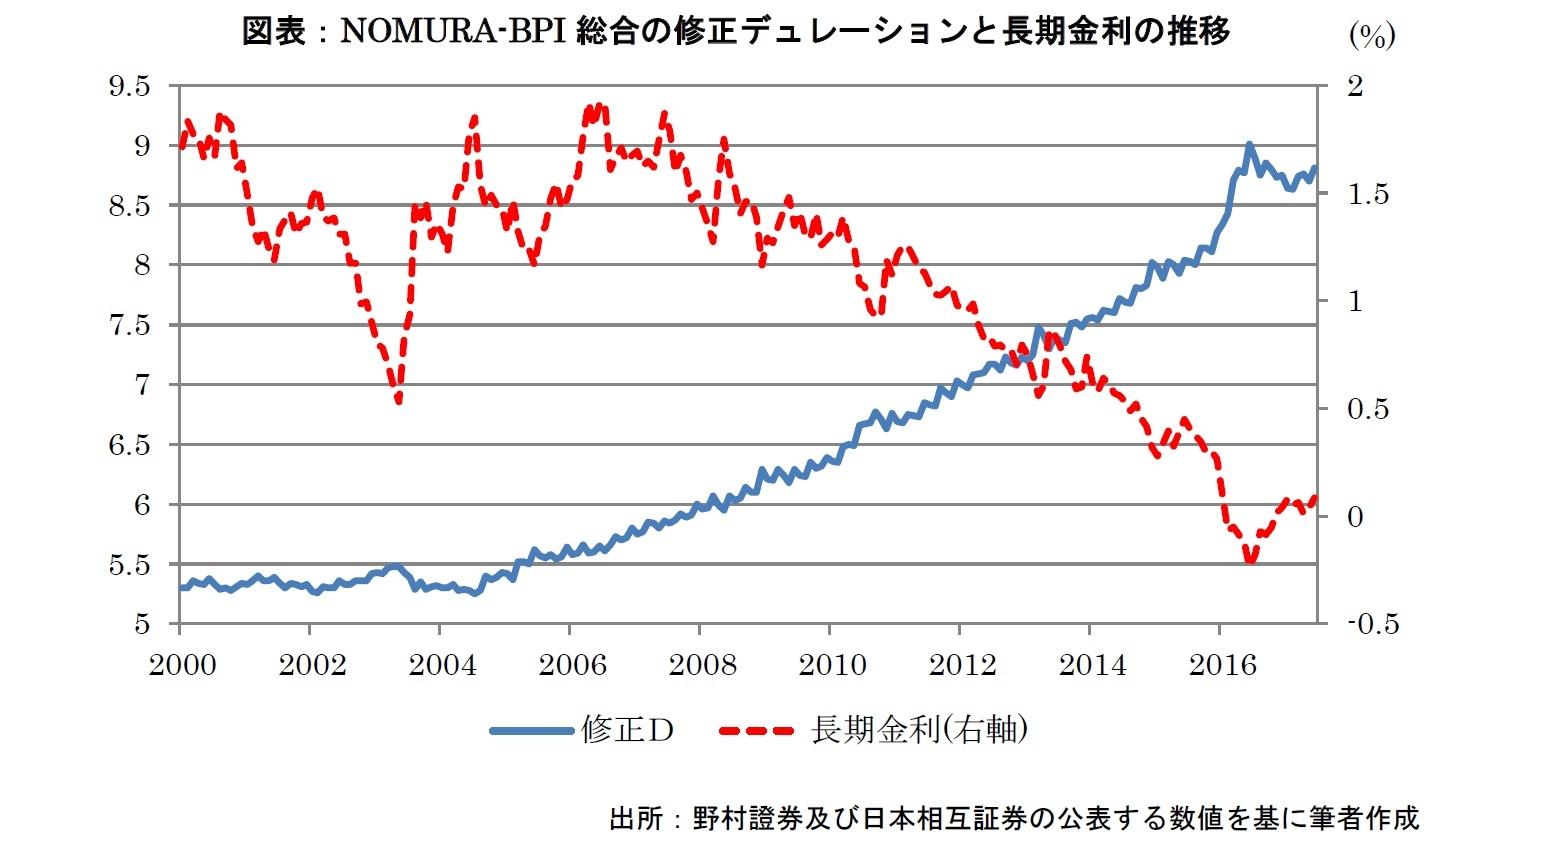 NOMURA-BPI総合の修正デュレーションと長期金利の推移